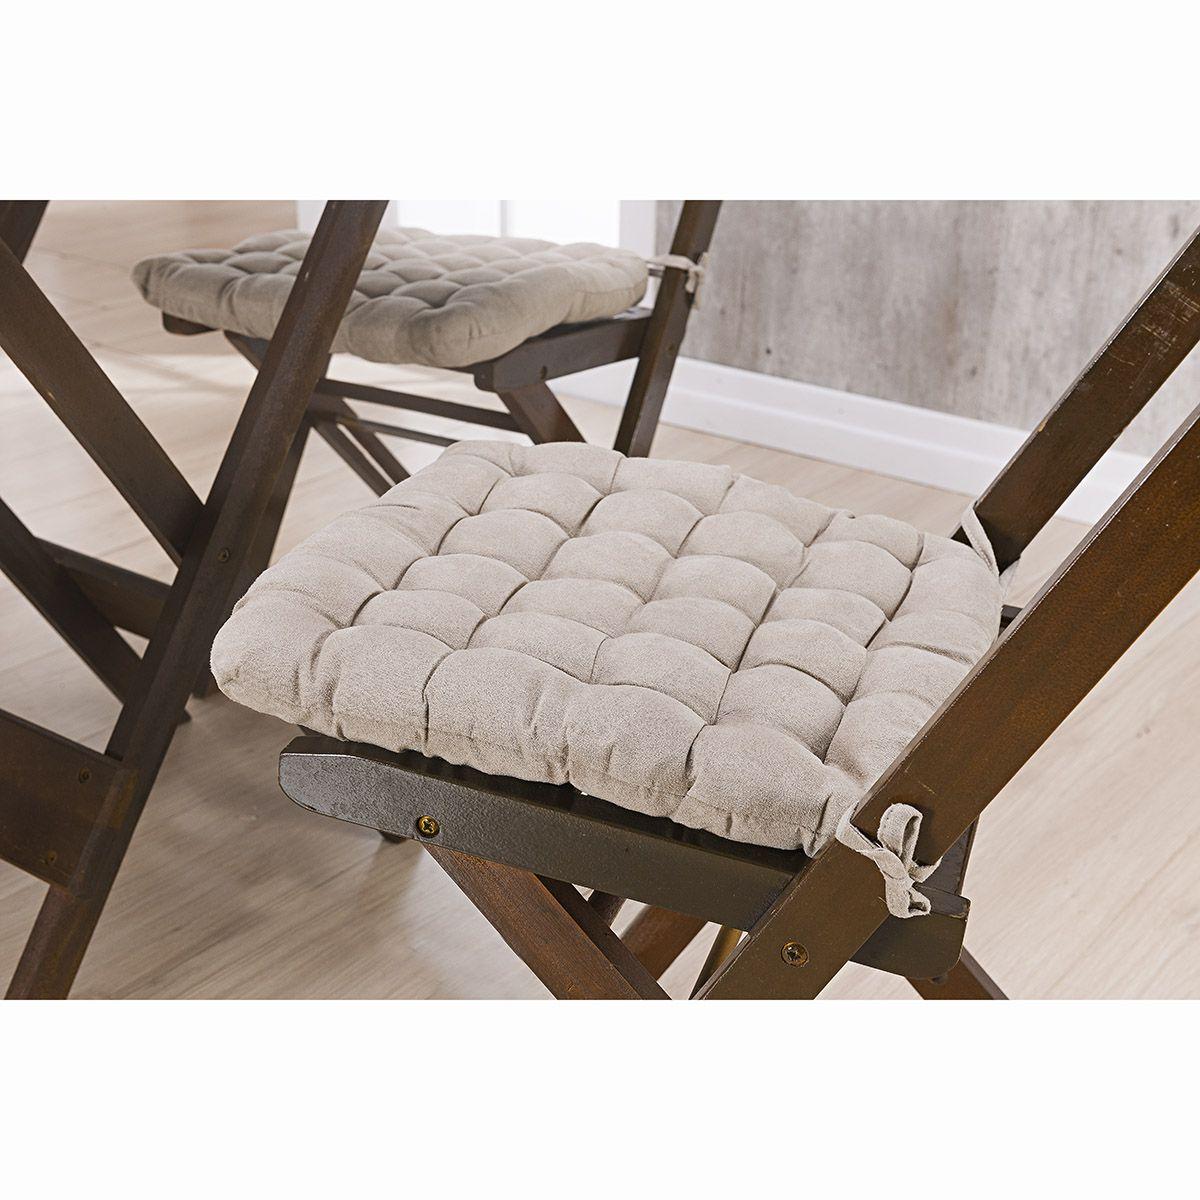 Assento P/ Cadeira - Futton - Kalamar - 40cm x 40cm - Areia - Niazitex